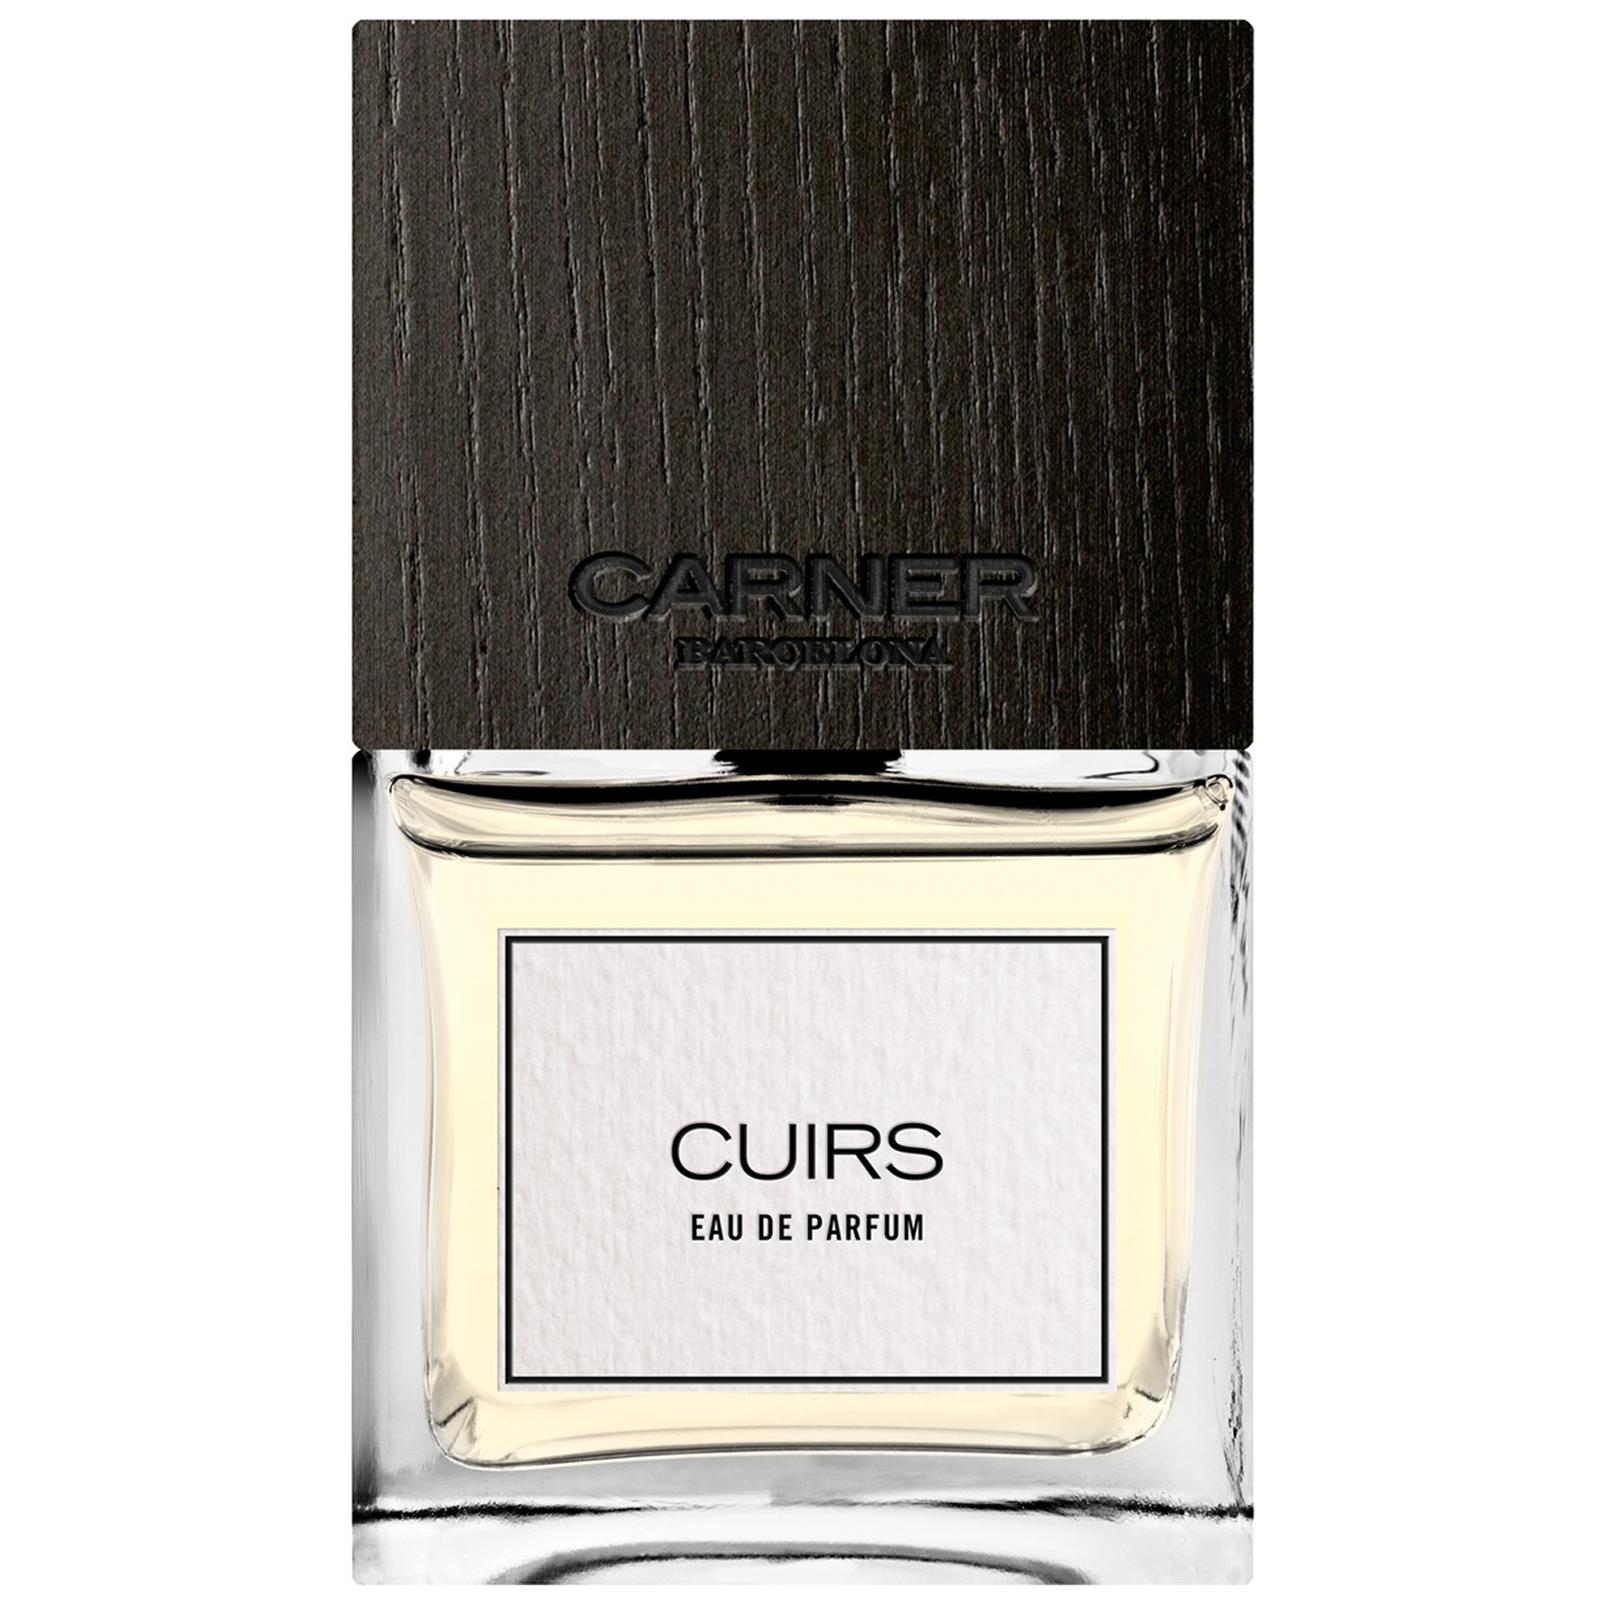 Cuirs profumo eau de parfum 50 ml